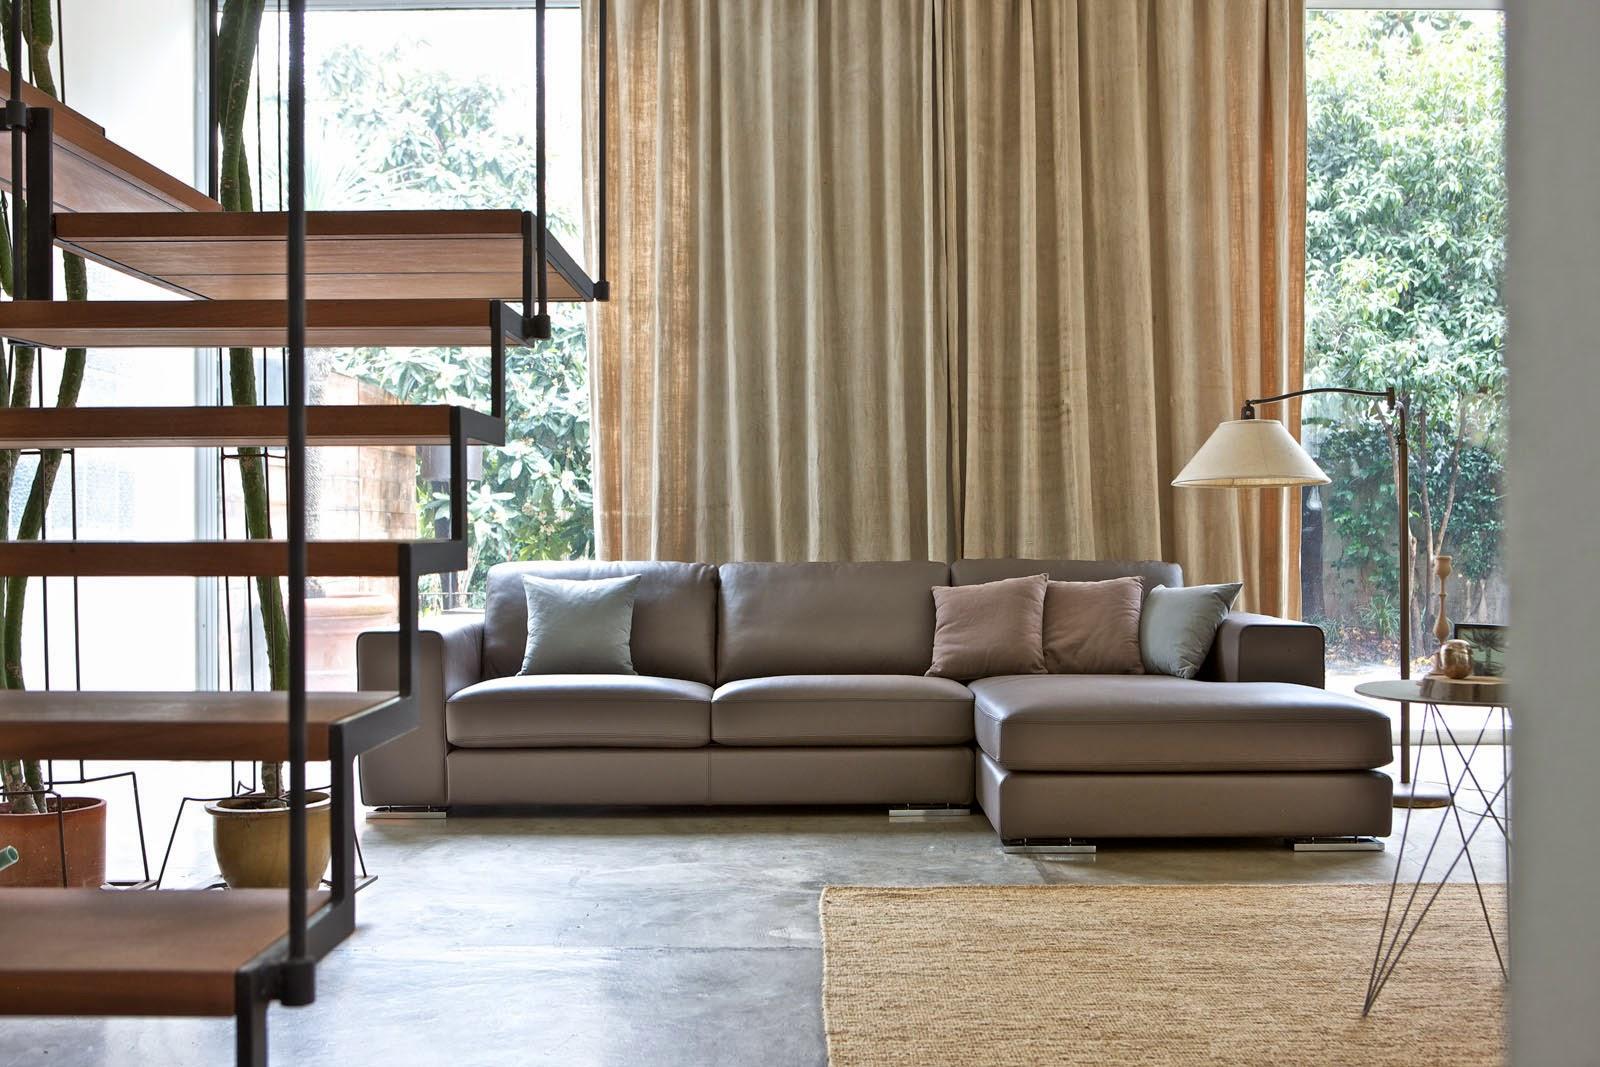 divani blog tino mariani divani moderni in pelle